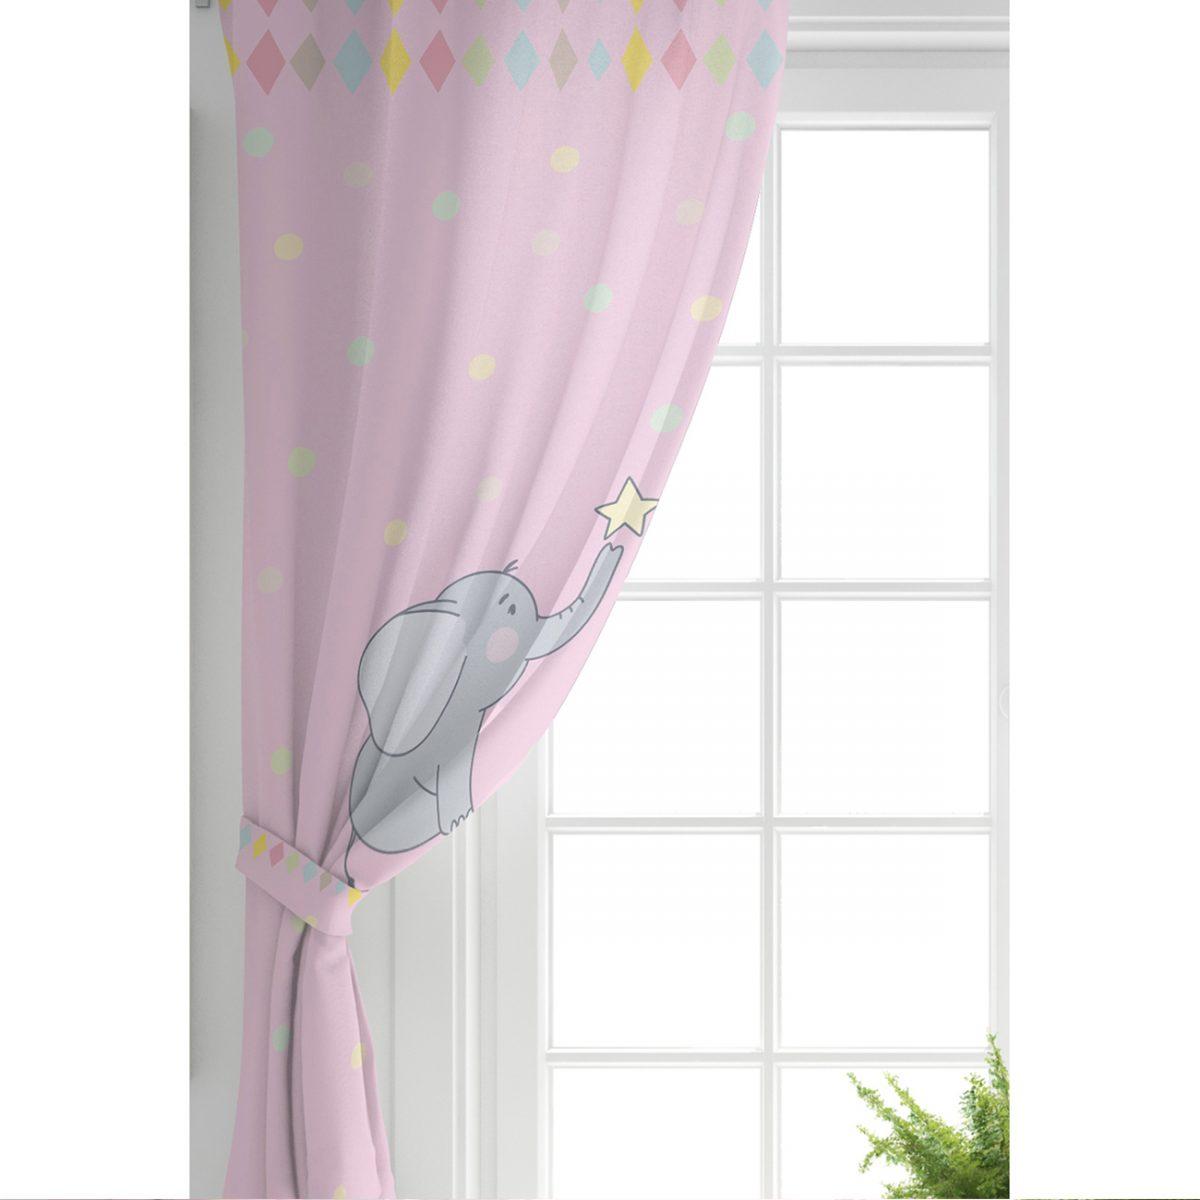 Sevimli Fil Baby Shower Tasarımlı Çocuk Odası Fon Perde Realhomes